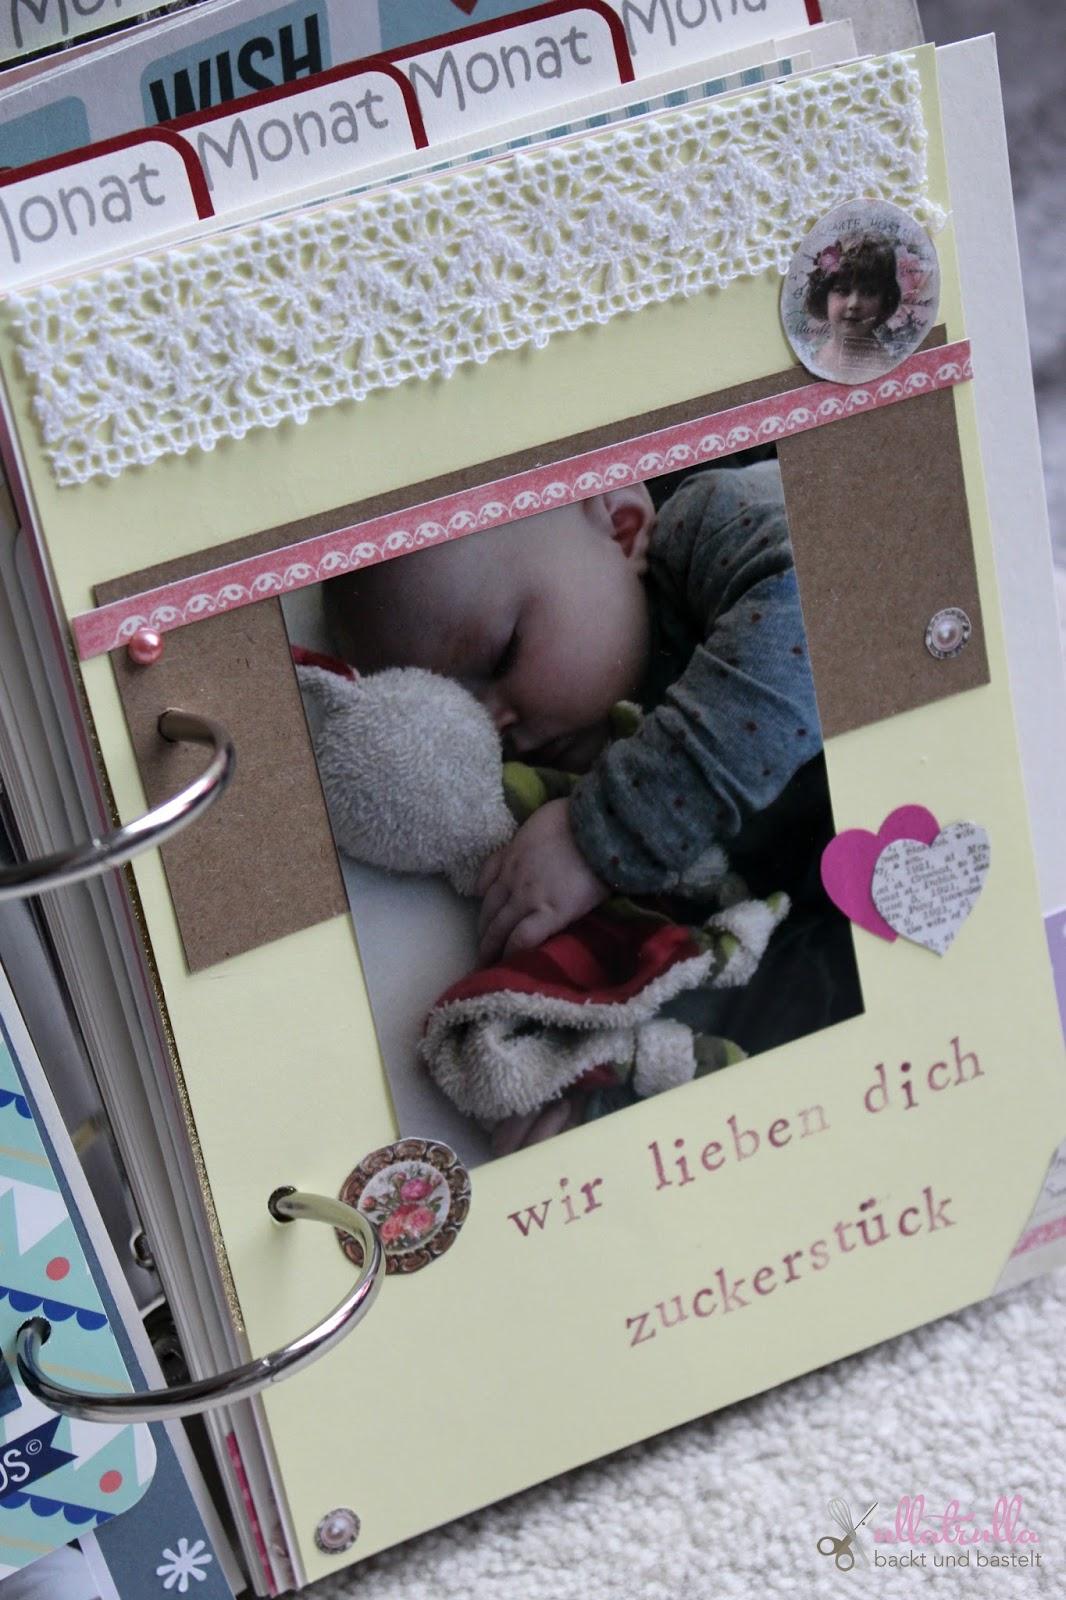 ullatrulla backt und bastelt diy babyalbum selber gestalten gewinnspiel geschlossen. Black Bedroom Furniture Sets. Home Design Ideas